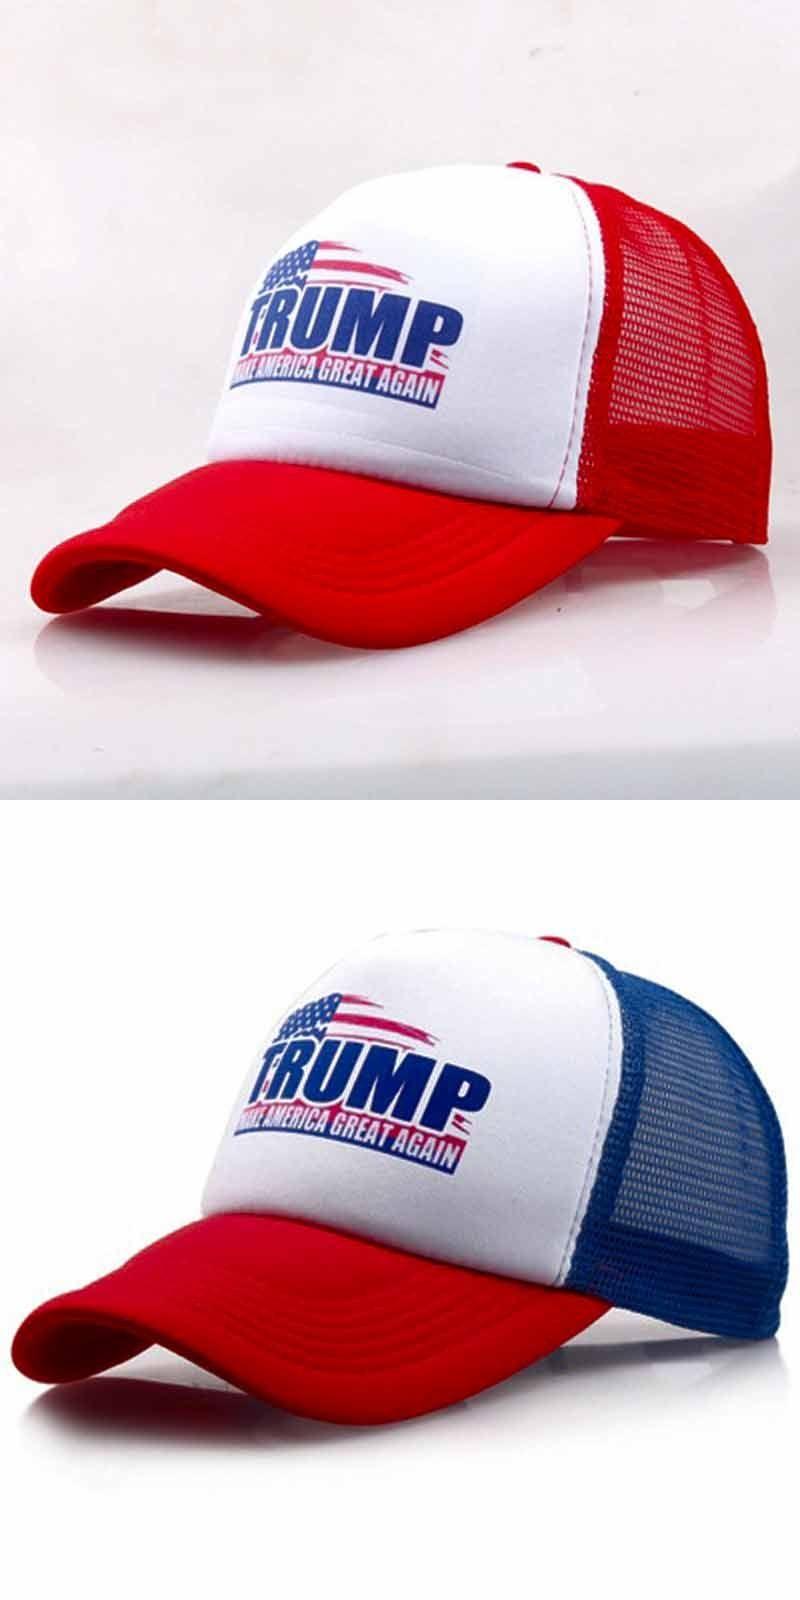 d6893befd04 JTVOVO Trump make america great again Cotton Adjustable Baseball Cap Unisex  Snapback Hat Outdoor Sports Hats